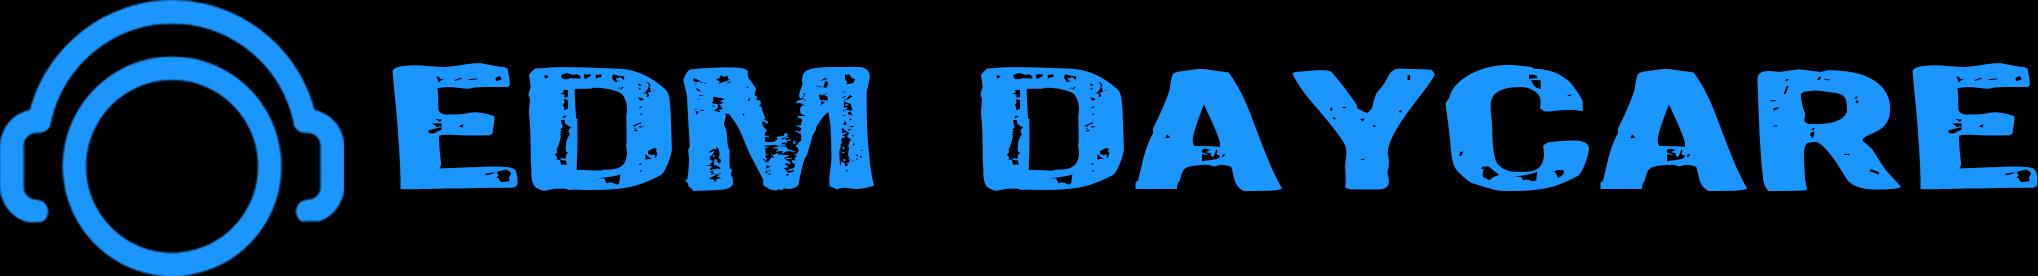 EDM Daycare | Best EDM Blog | EDM Blog for Music Festivals, Electronic Dance Music, & it's Incredible Culture!